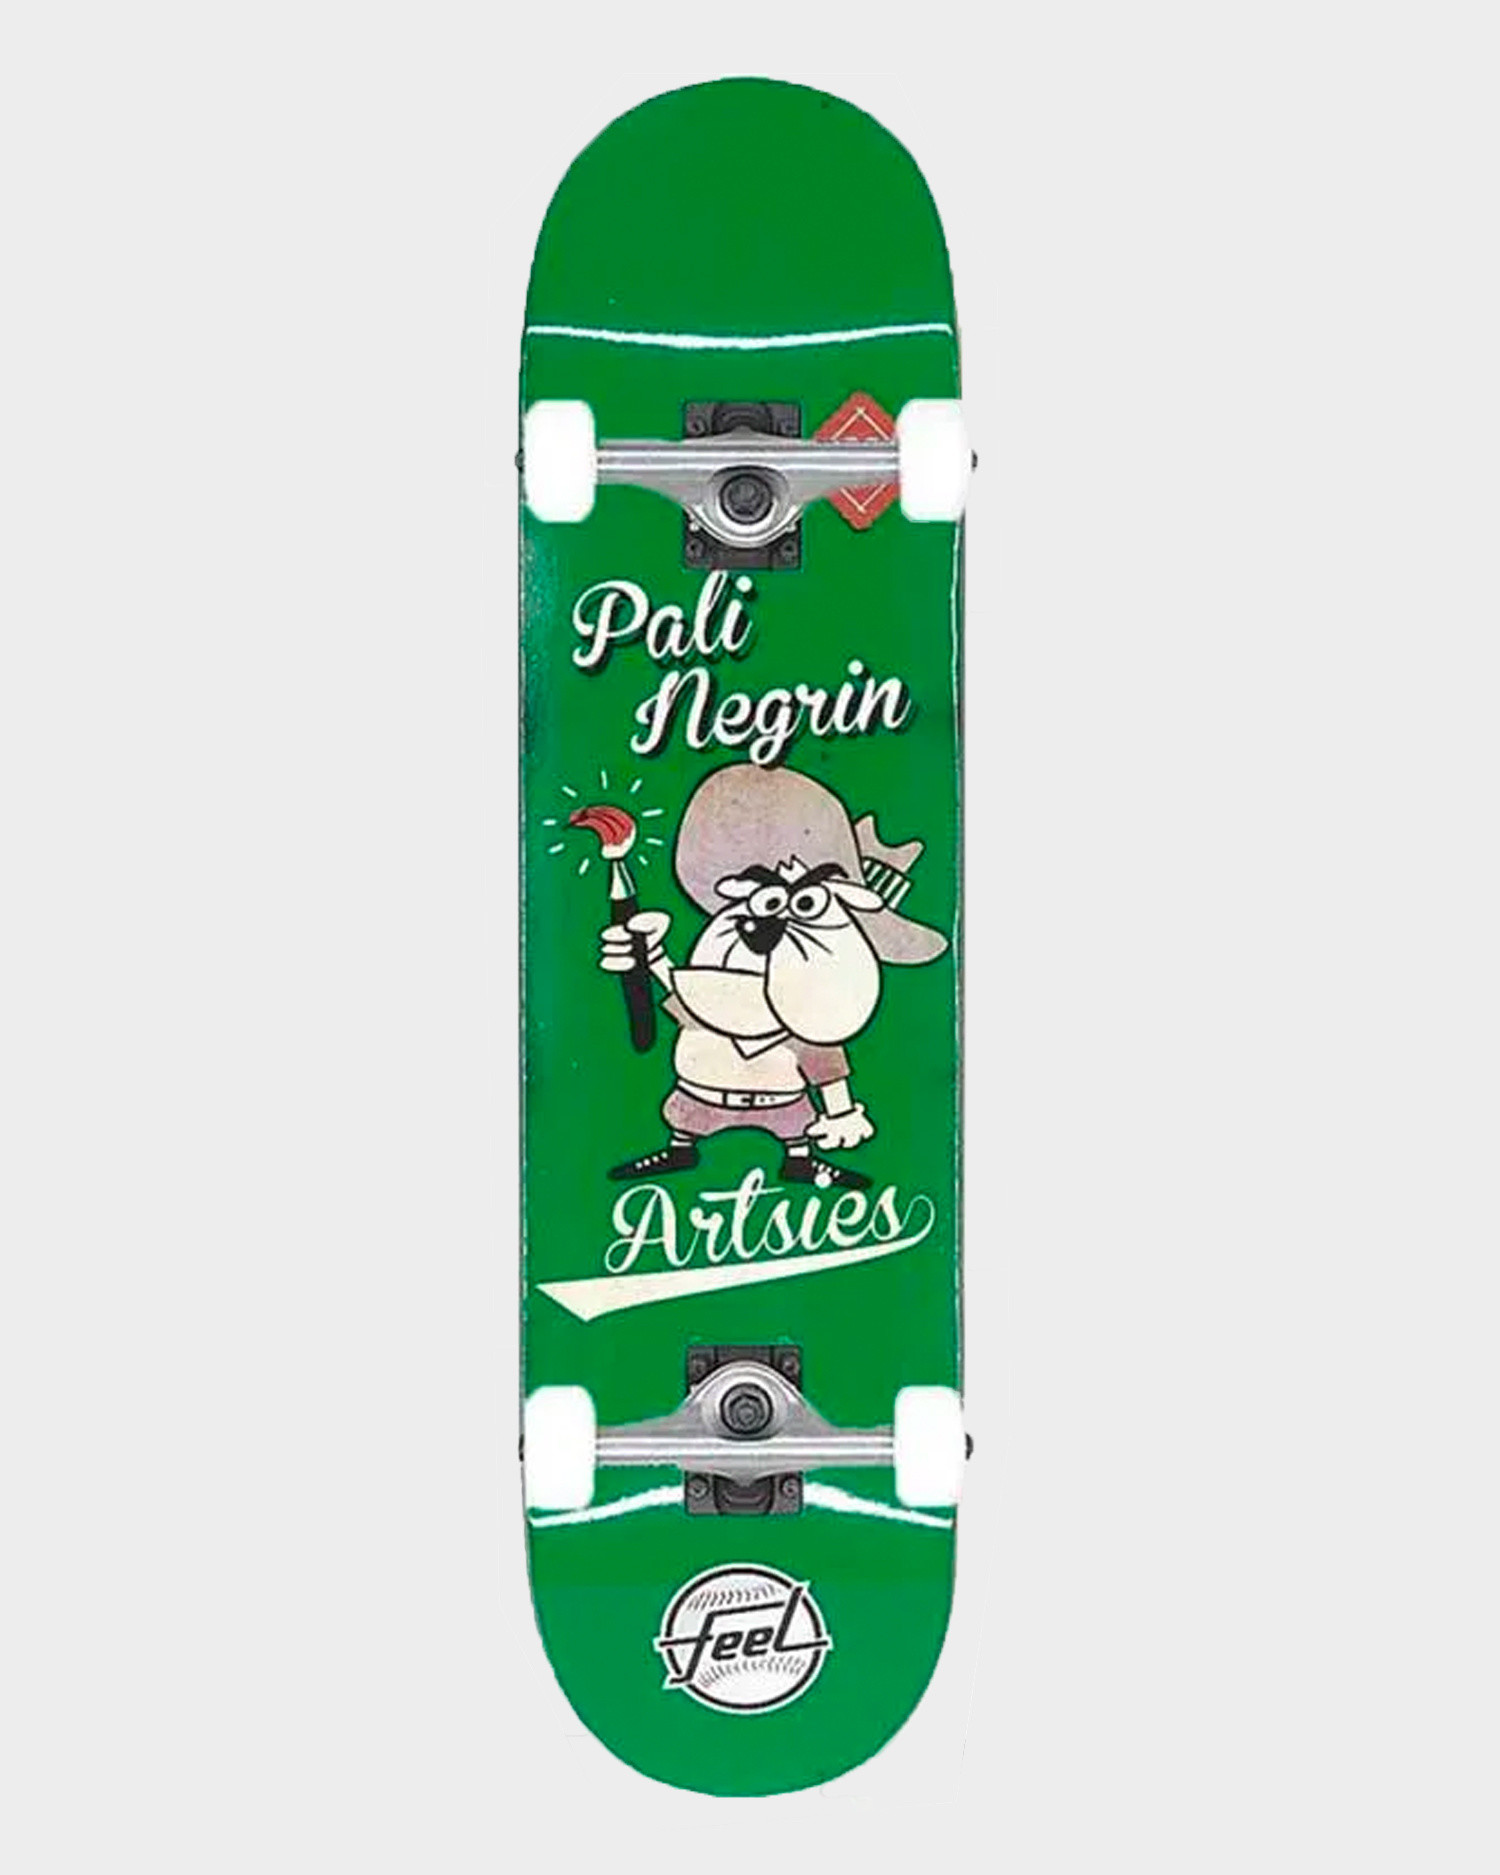 Feel Skateboards Artsies Complete Green 7.75